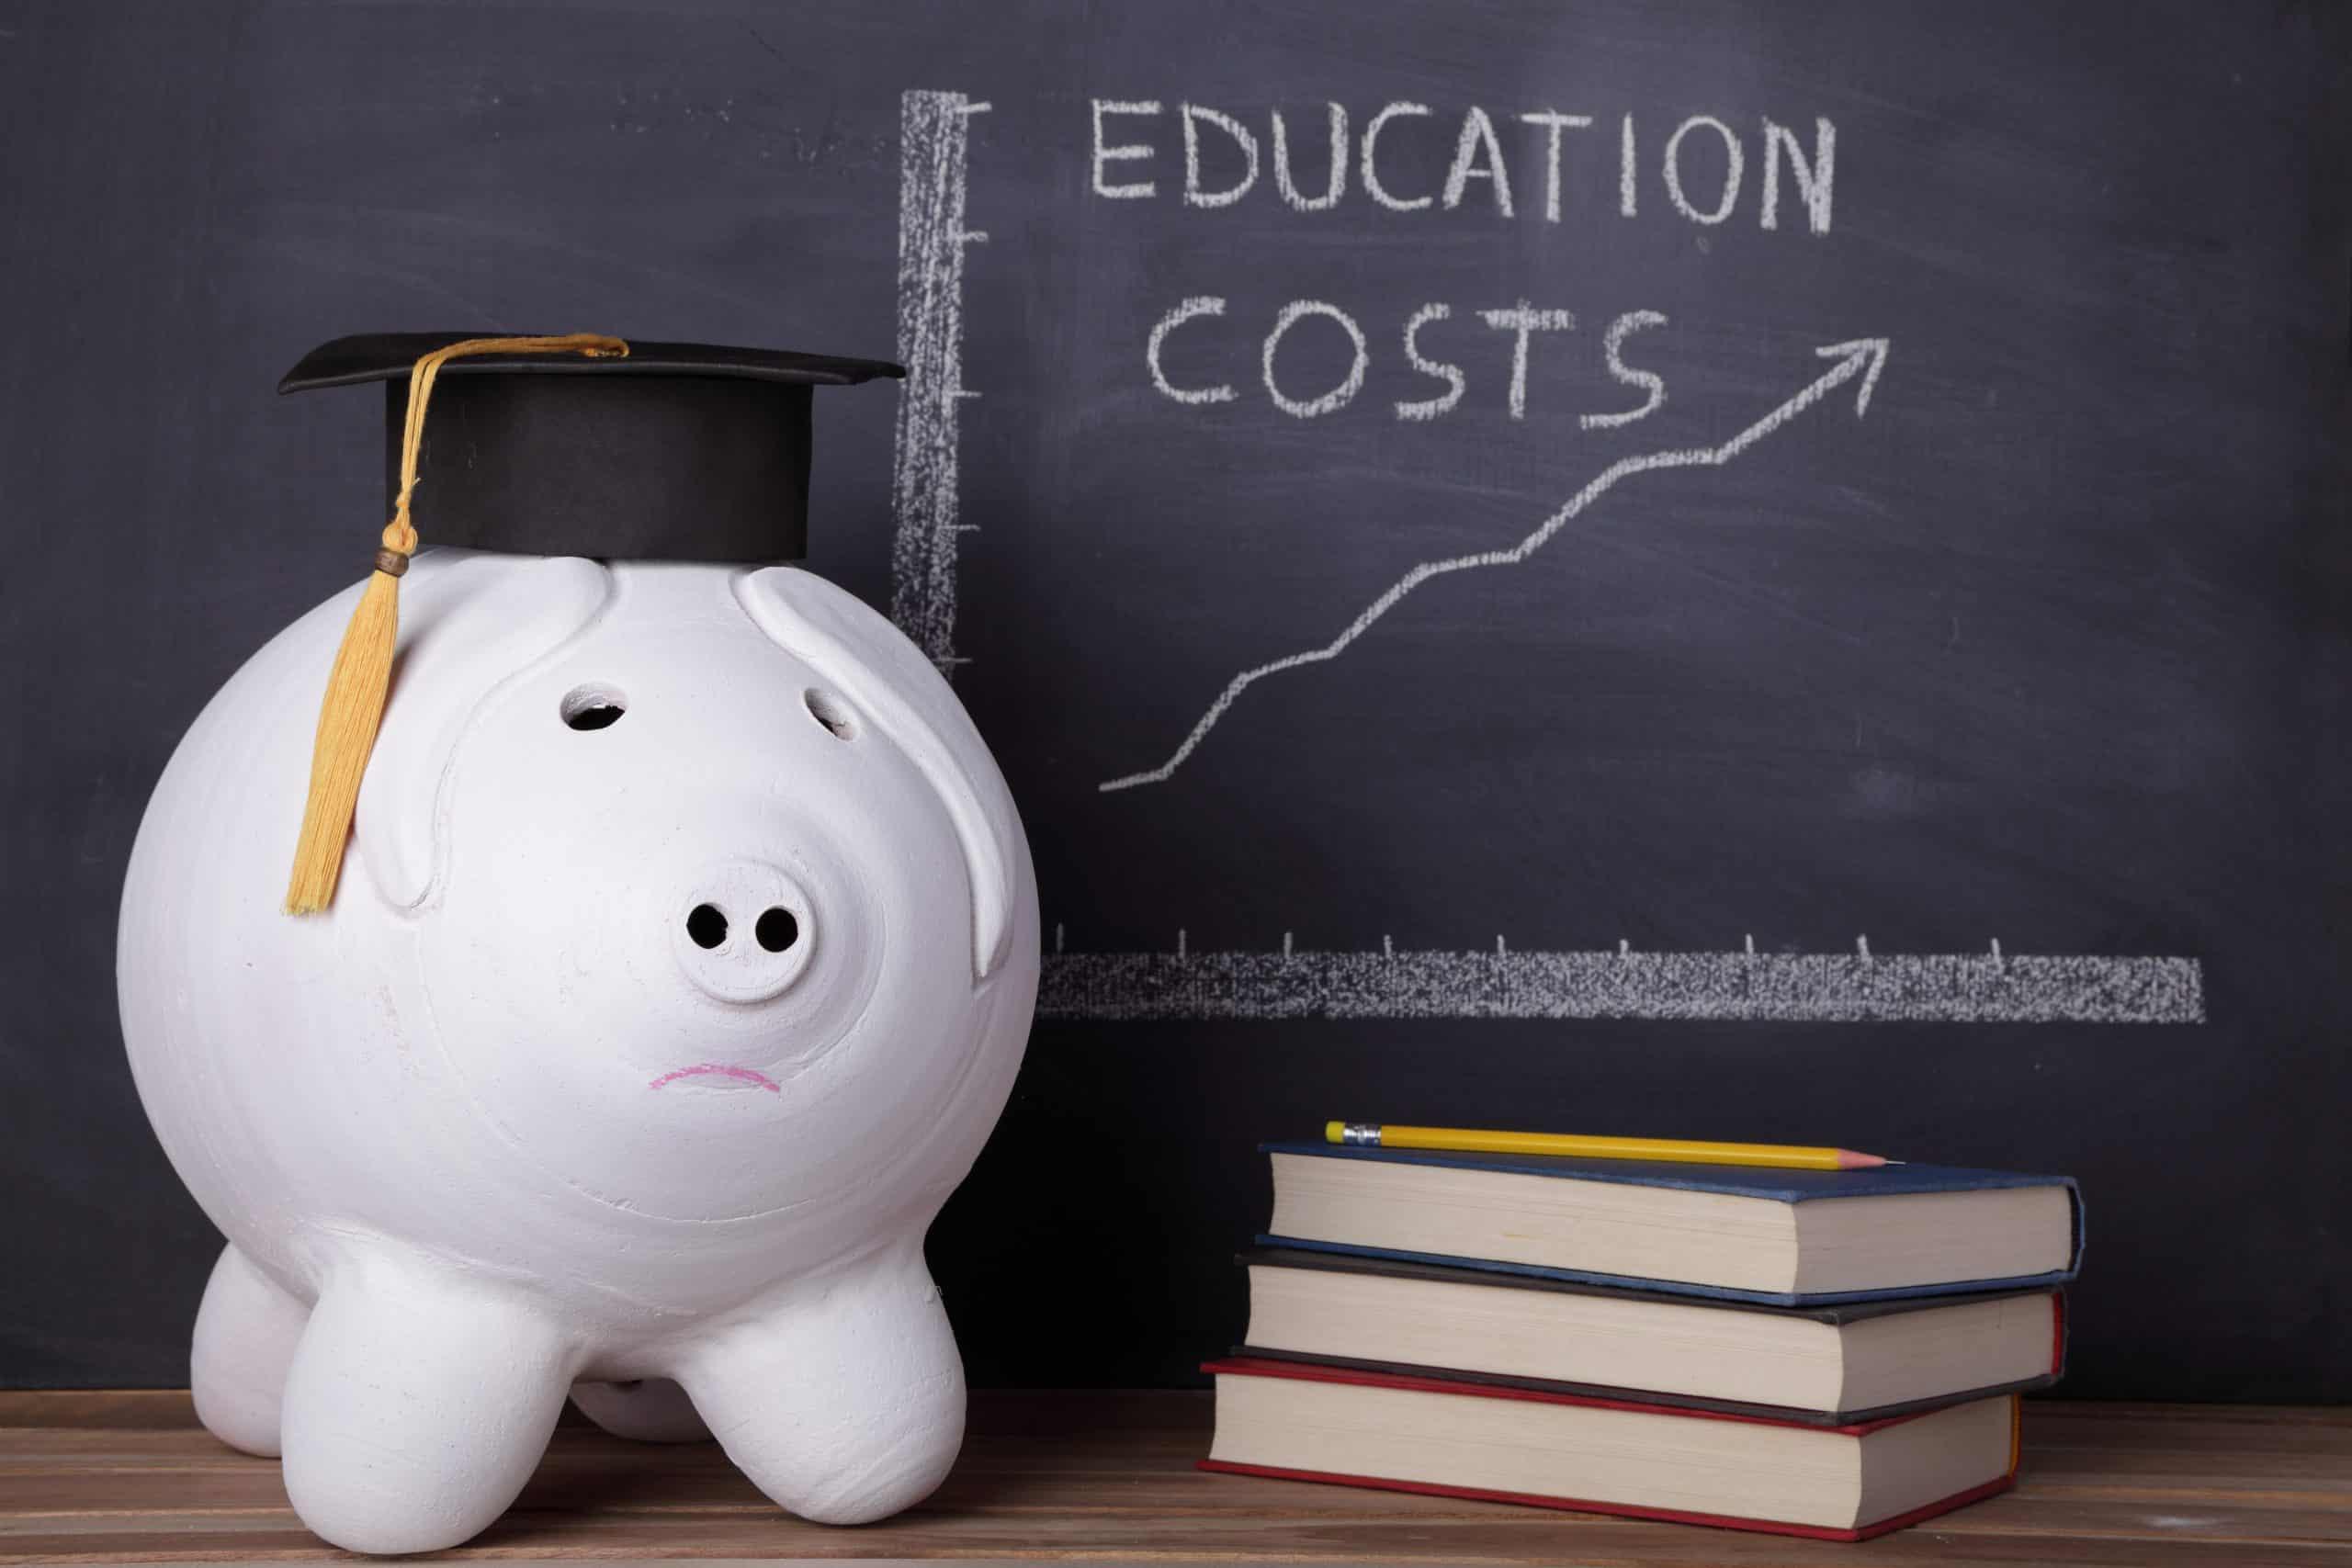 Disabled Veterans Student Loan Debt Statistics